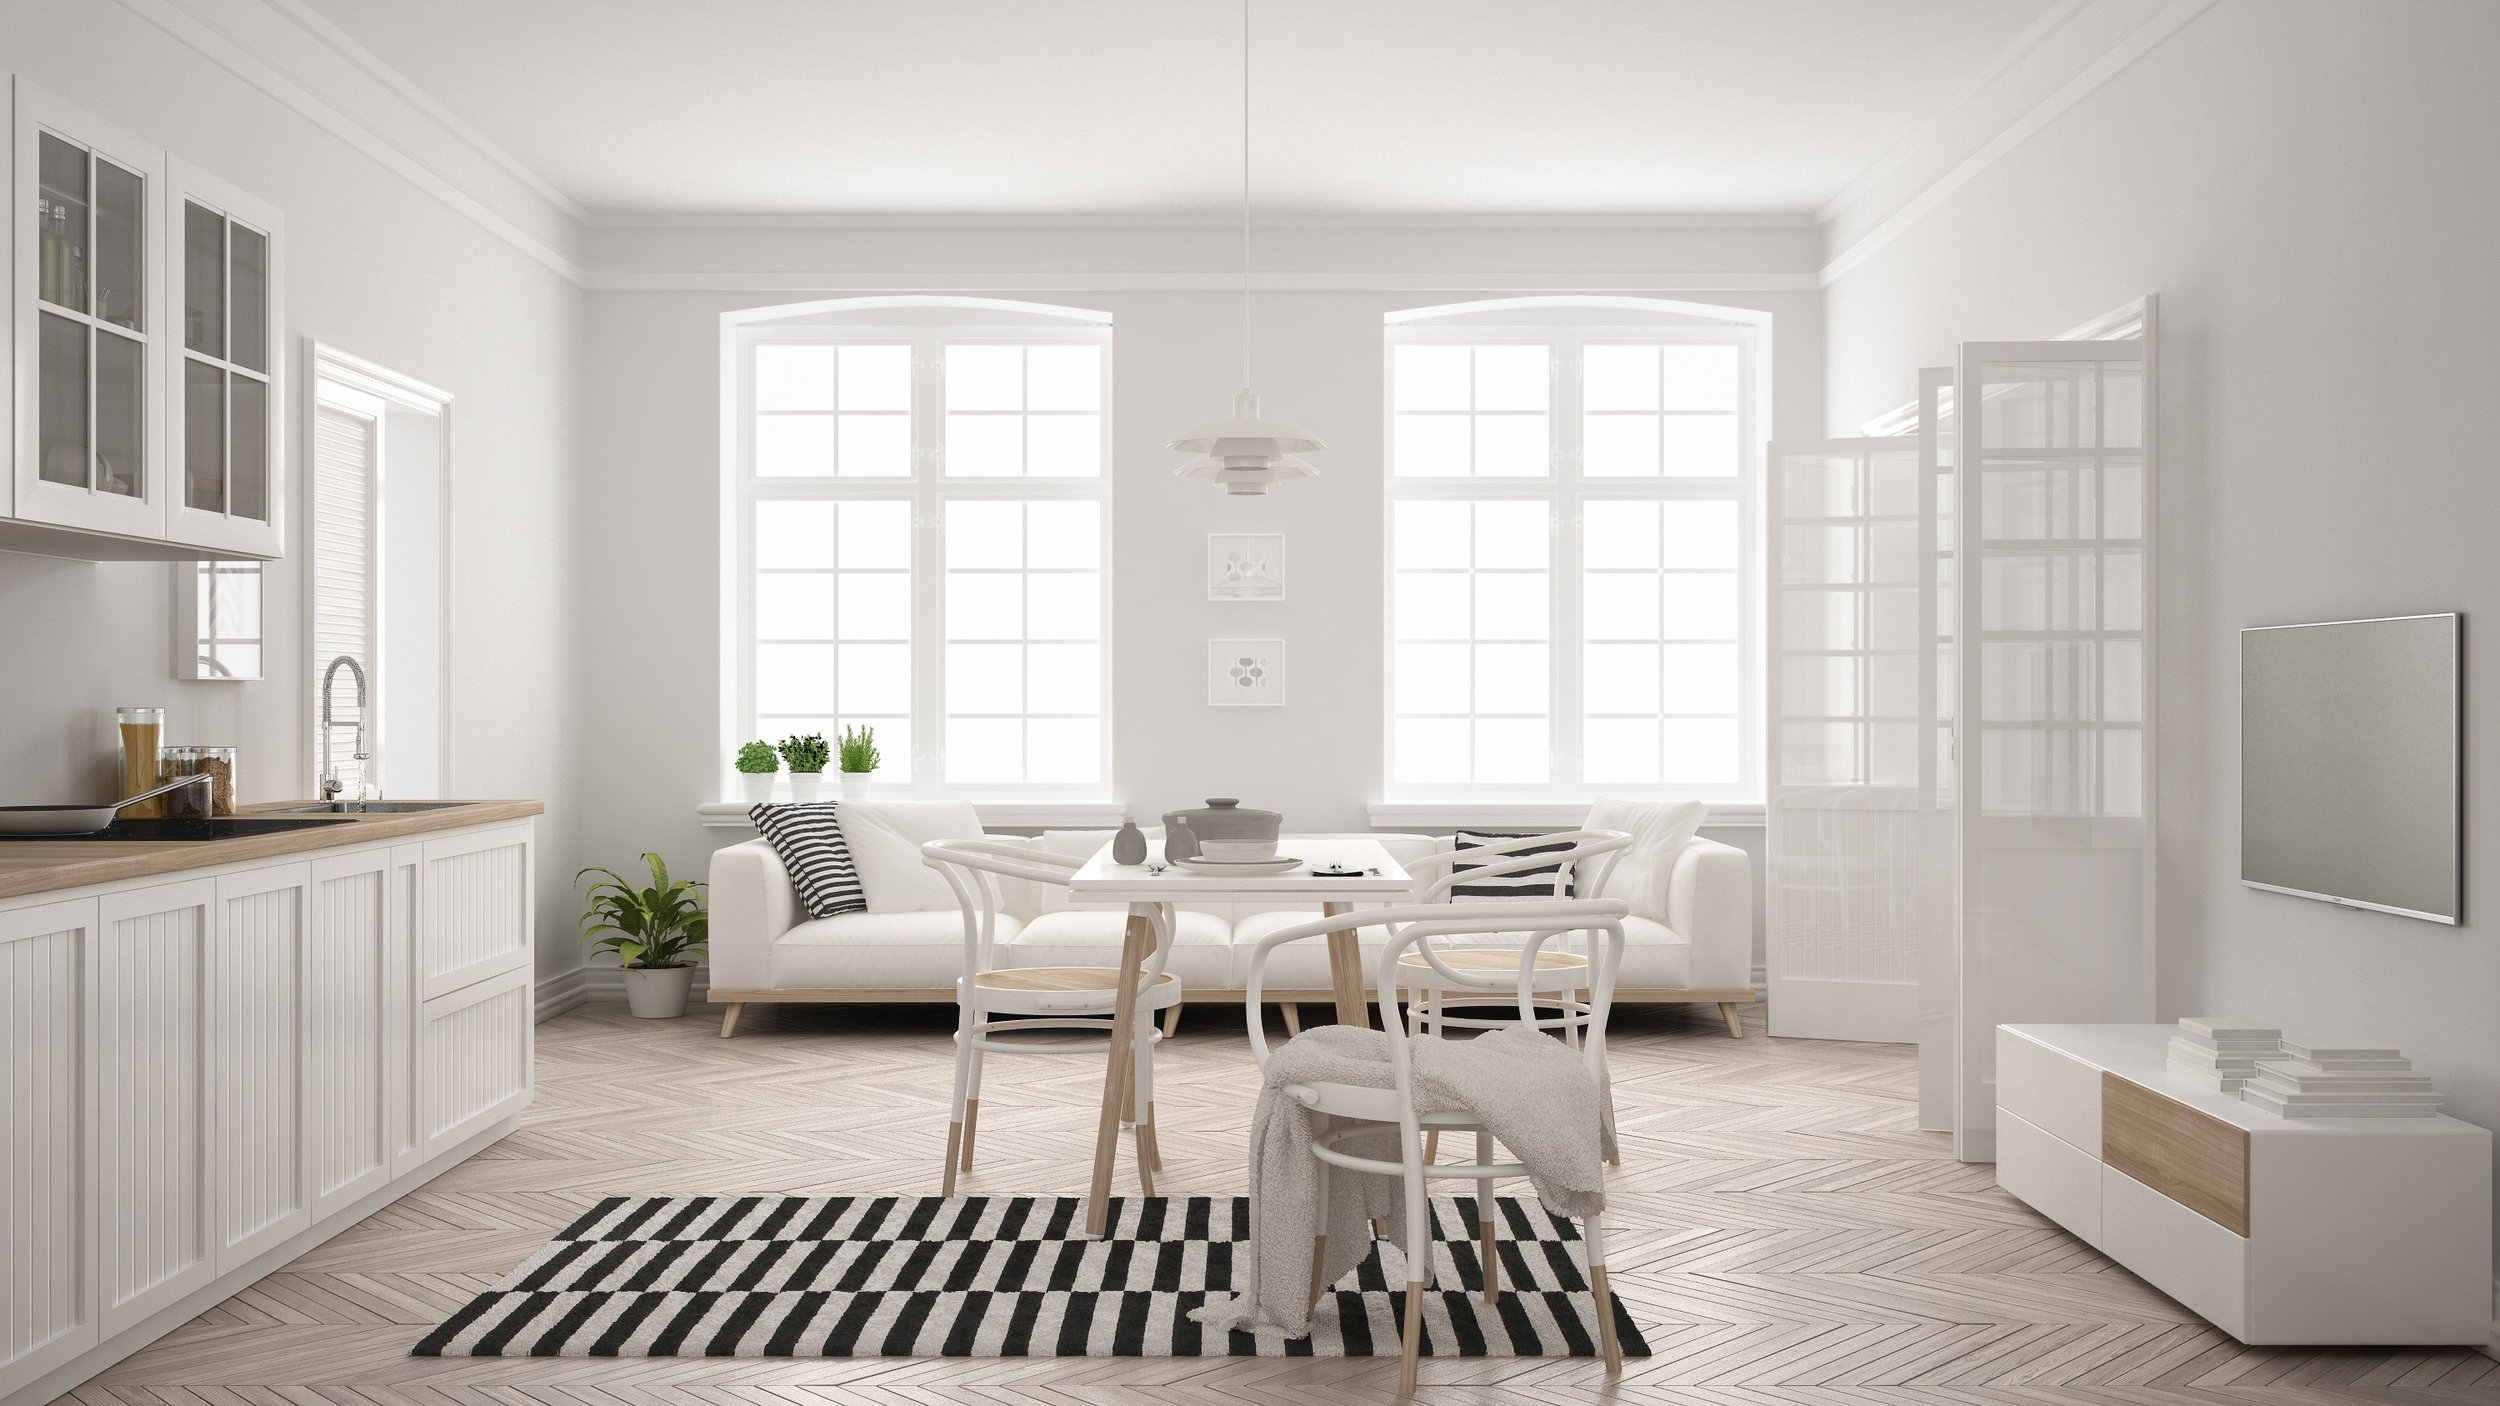 Residential Evaluations_iStock-697225446.jpg